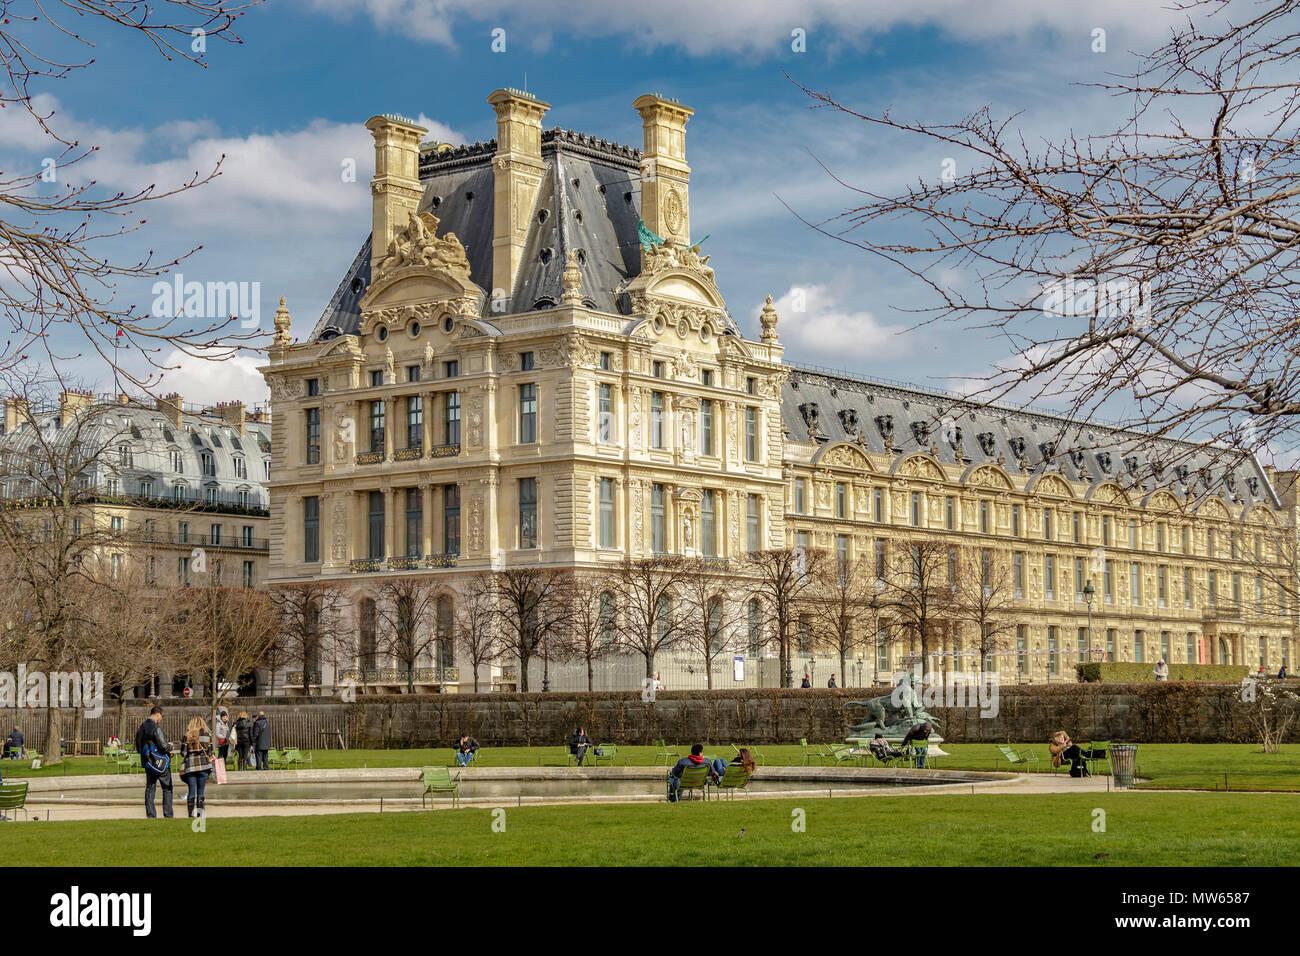 Musee De Louvre Stockfotos & Musee De Louvre Bilder - Alamy